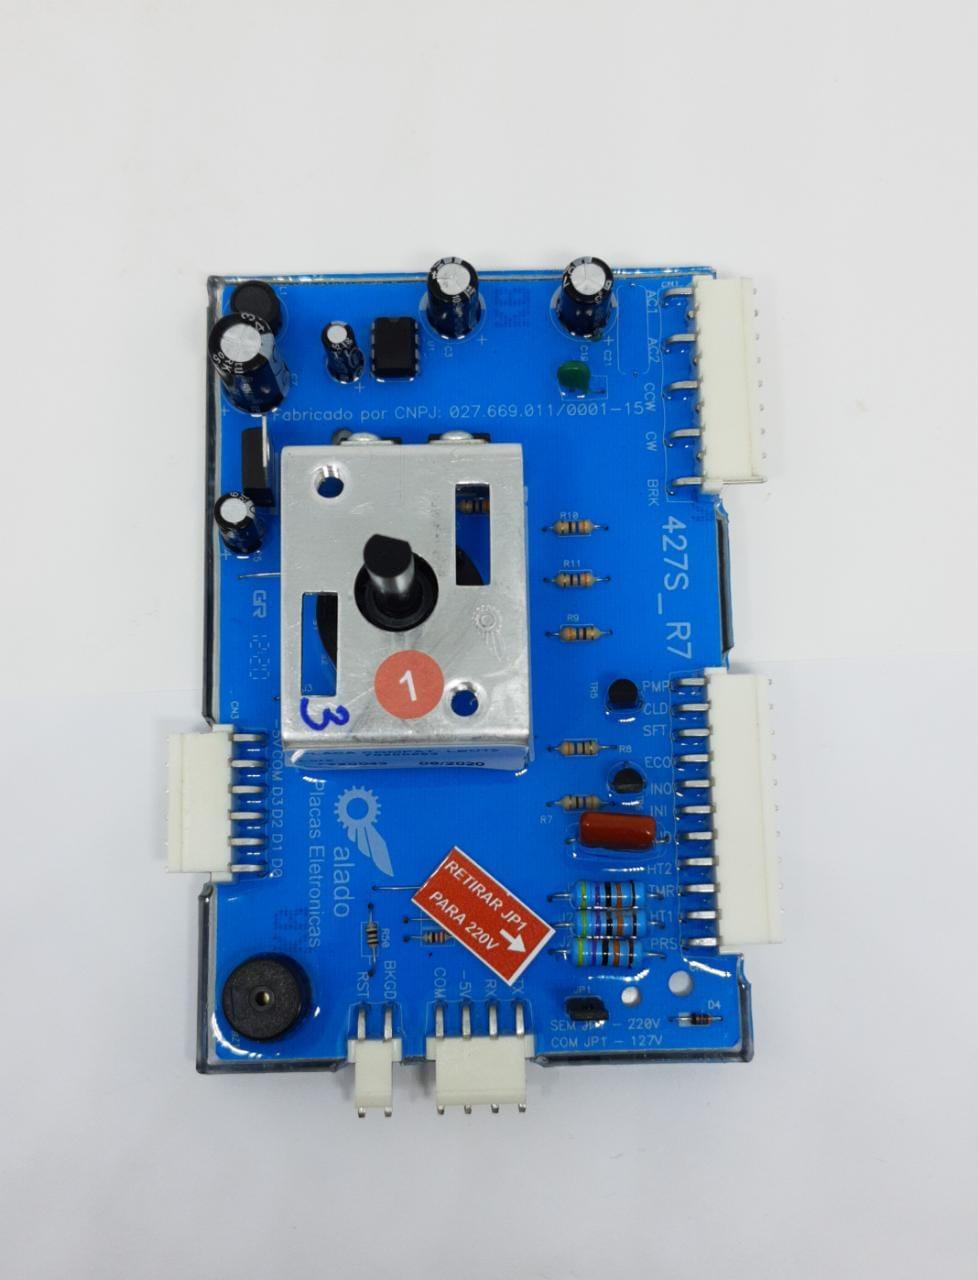 Placa Potencia Electrolux Lbu15 - 70200963 - Alado